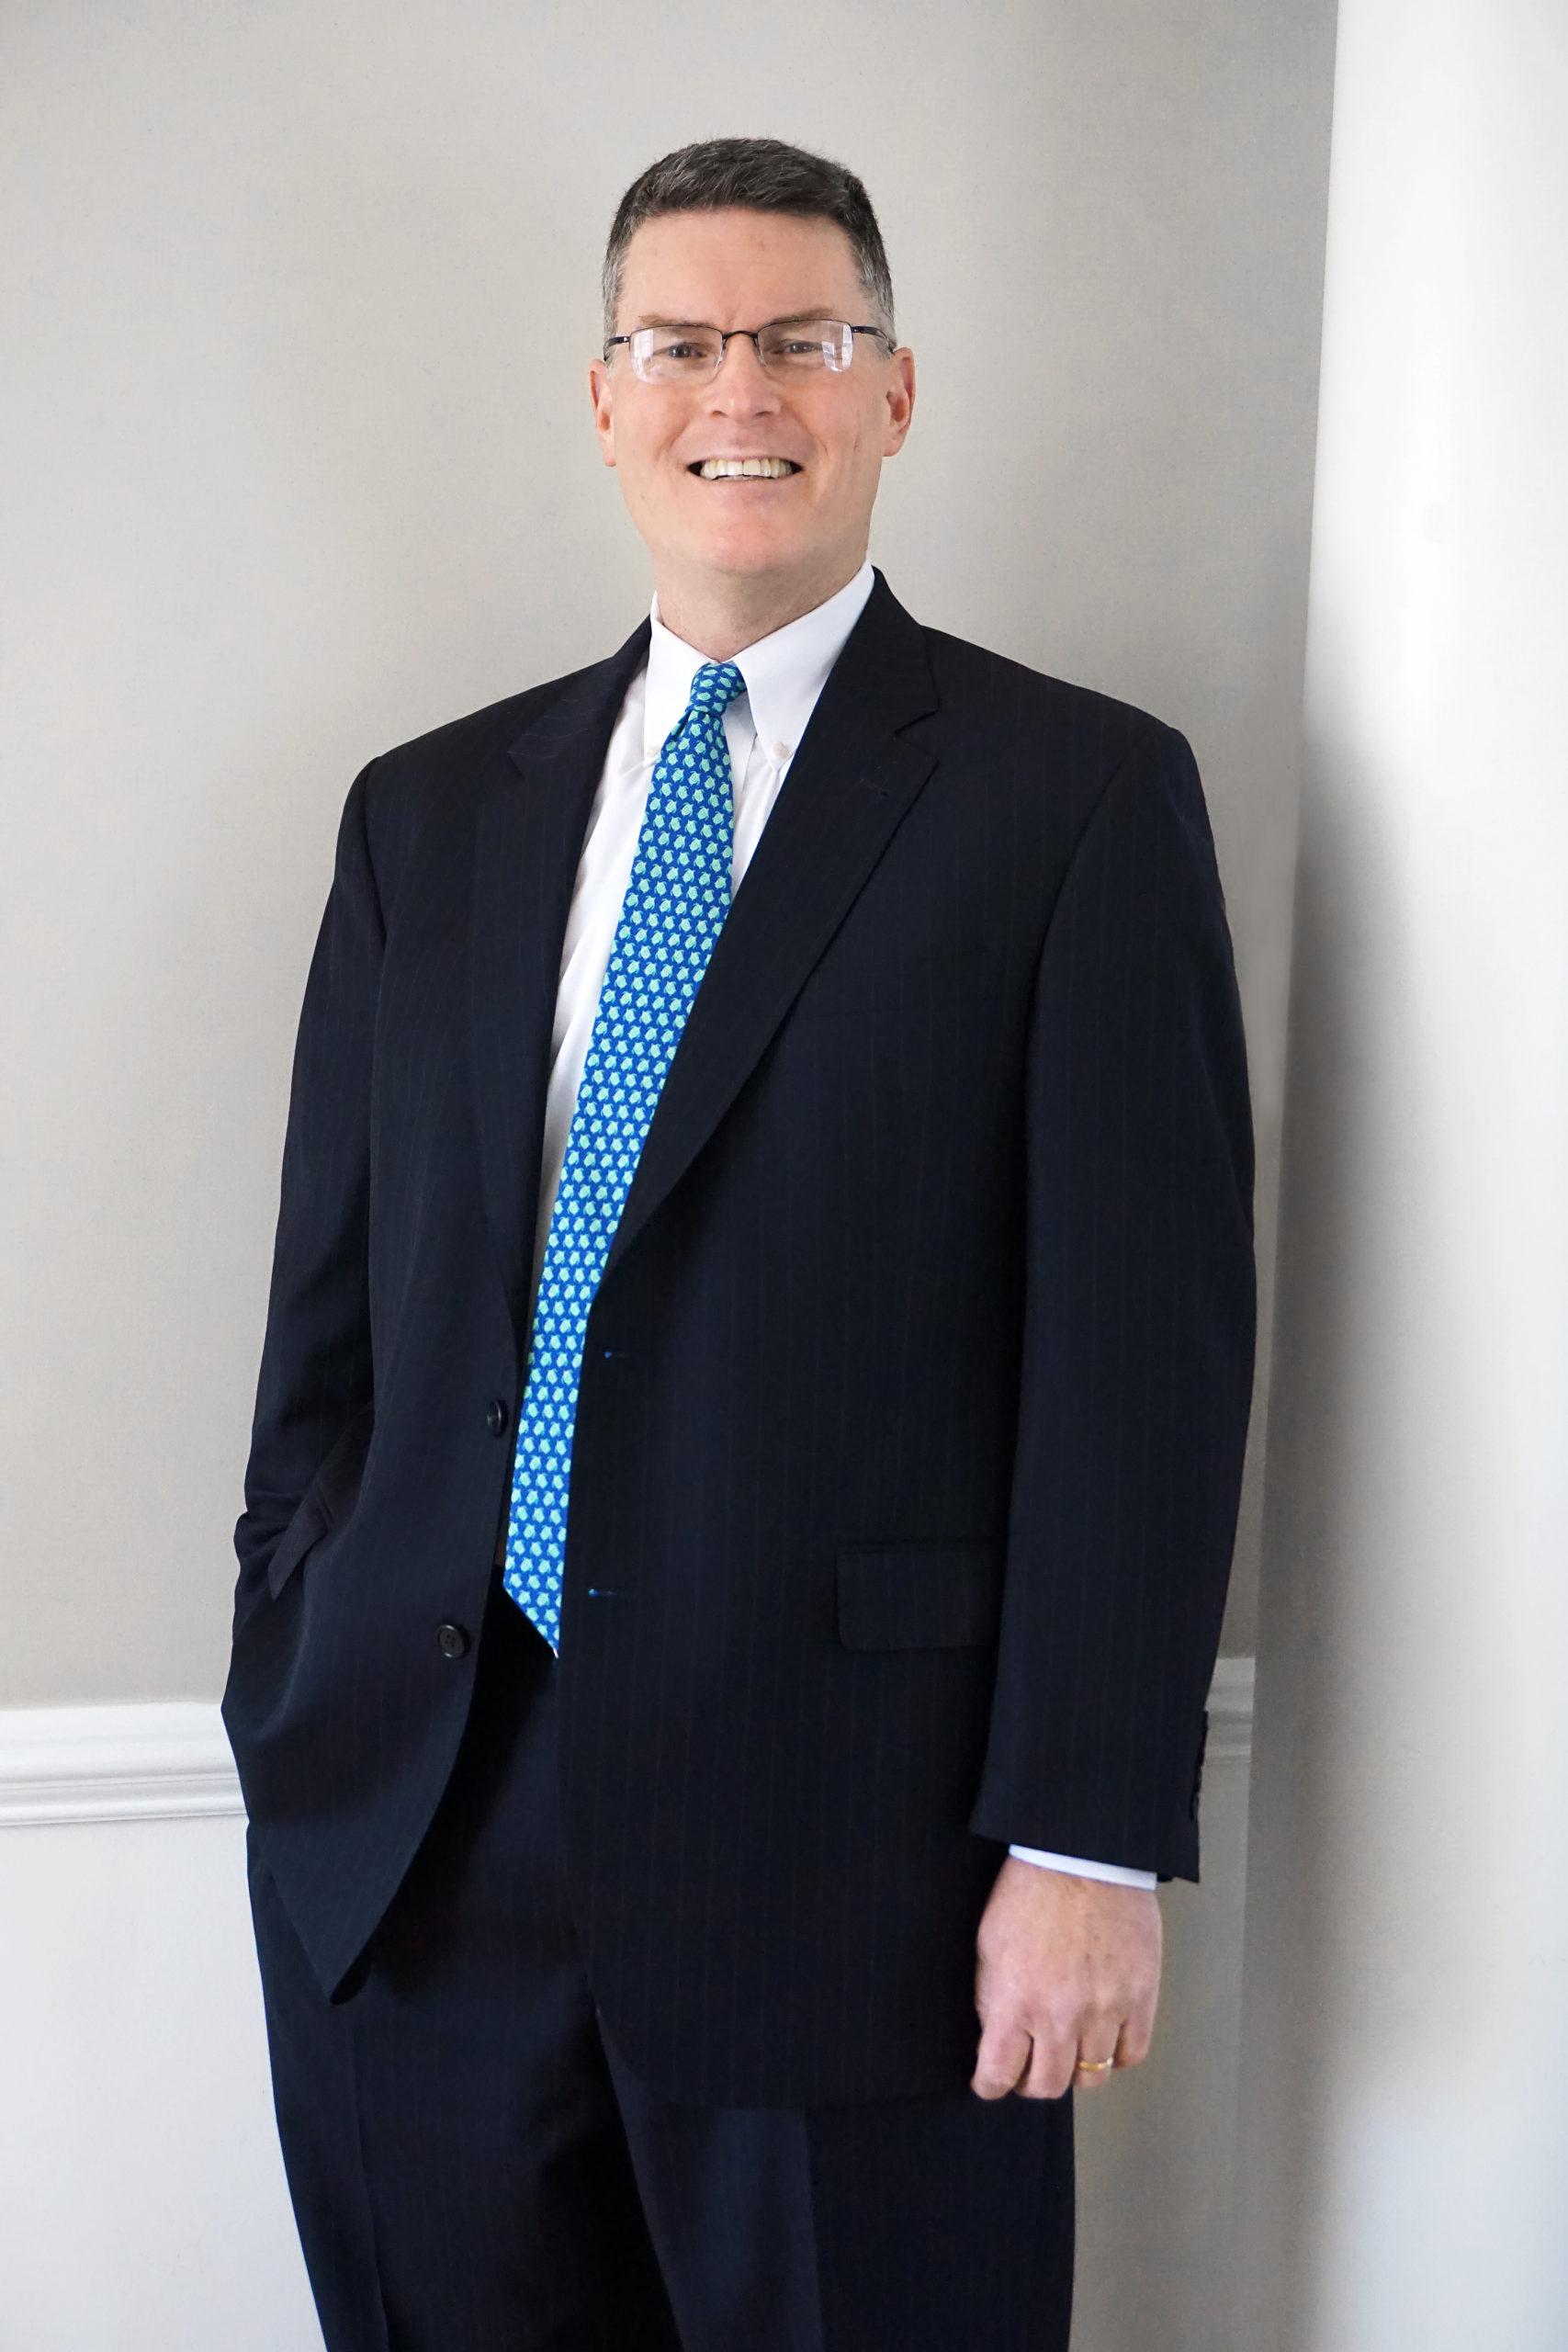 Brendan Malley QBE